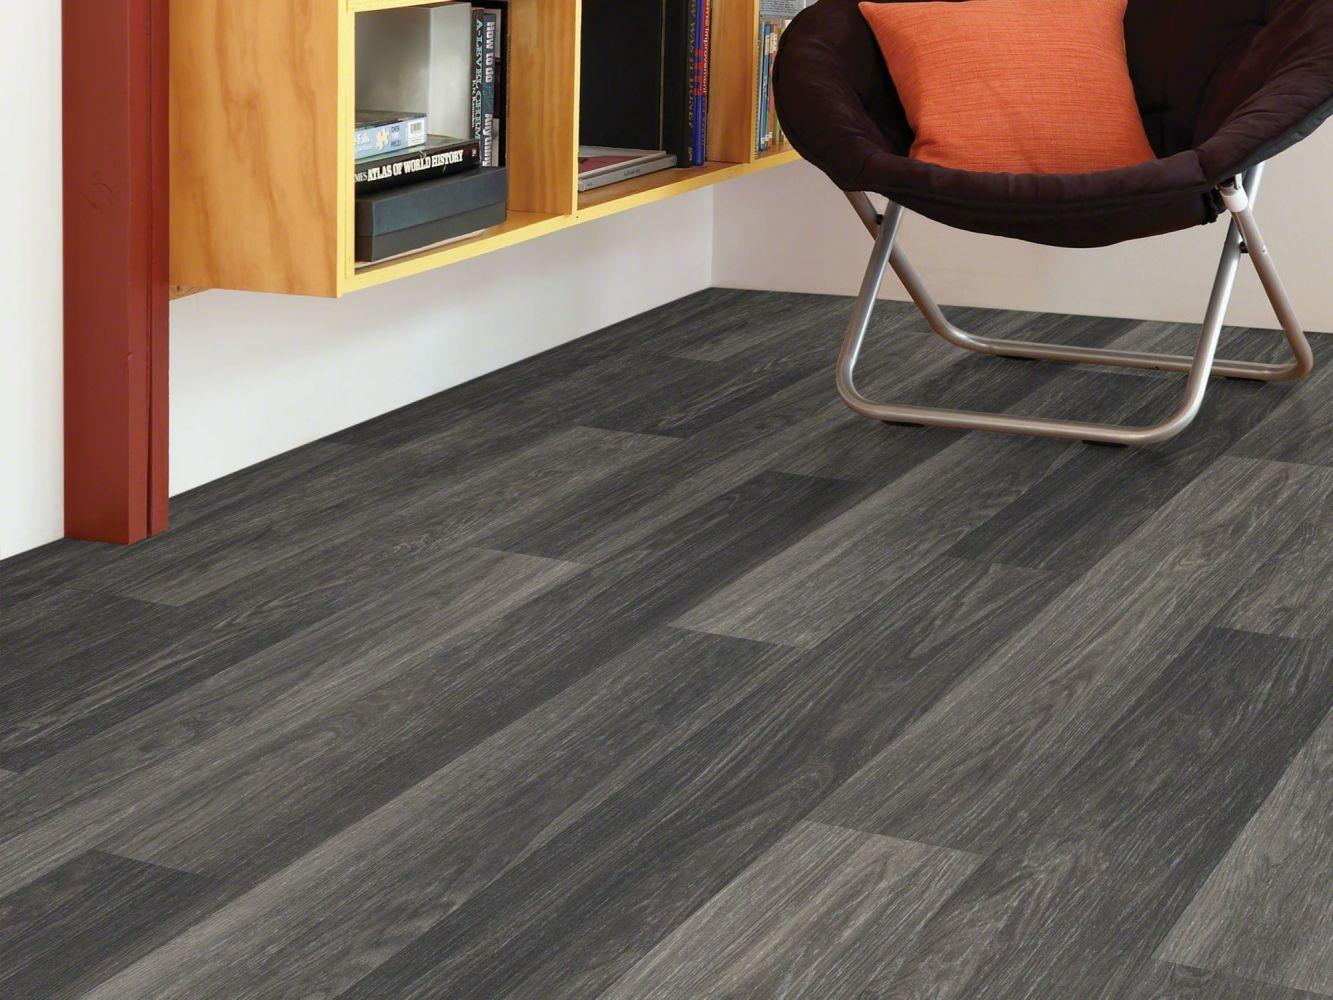 Shaw Floors Resilient Residential Coastal Plainii Chaparral 00742_0463V